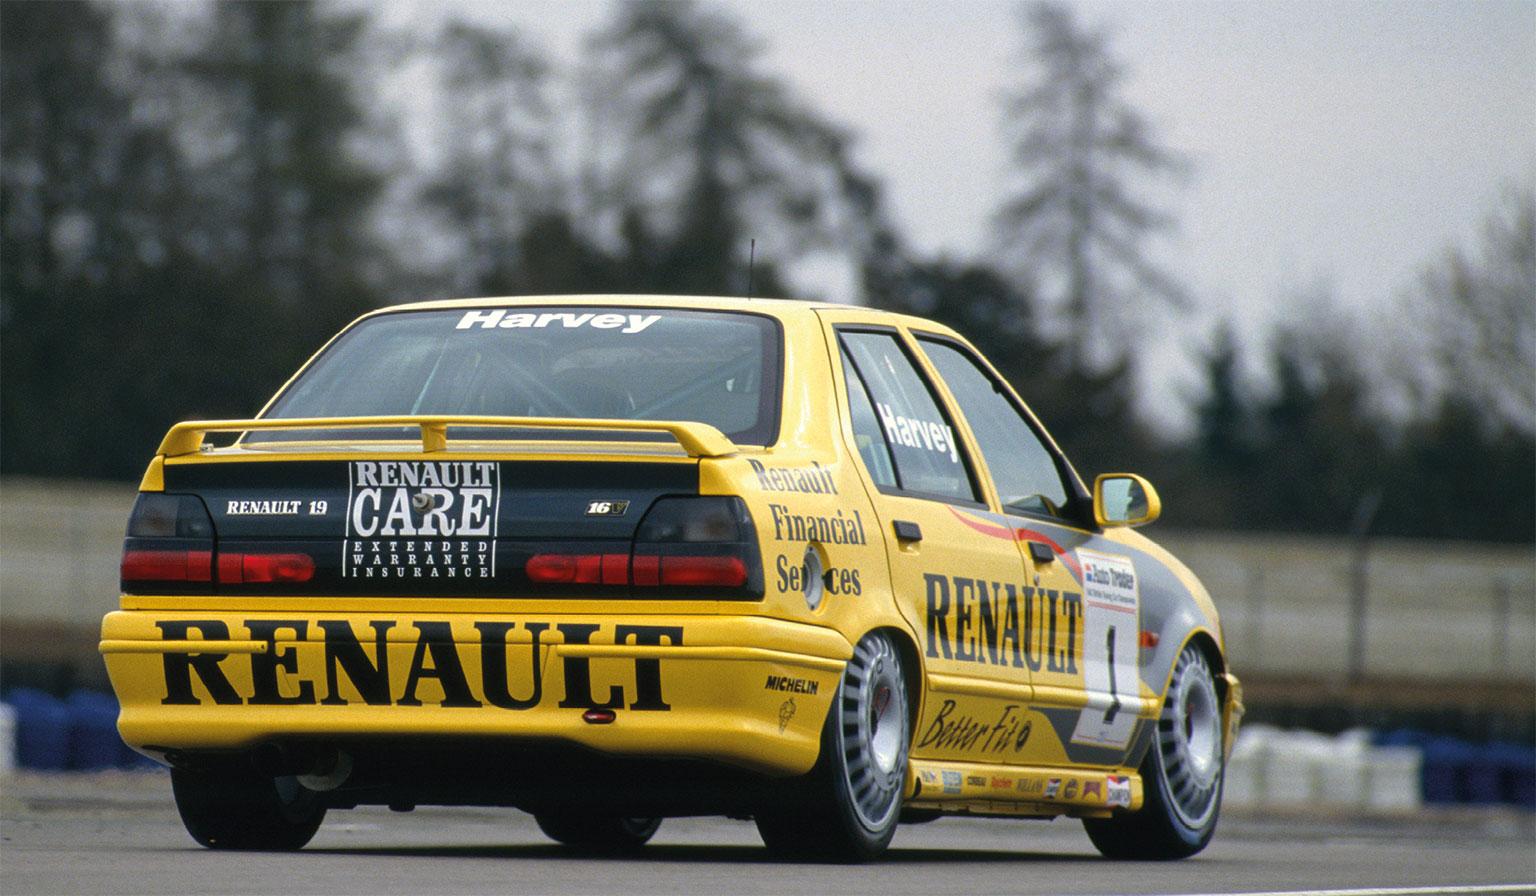 Renault 19 season was a year of purgatory